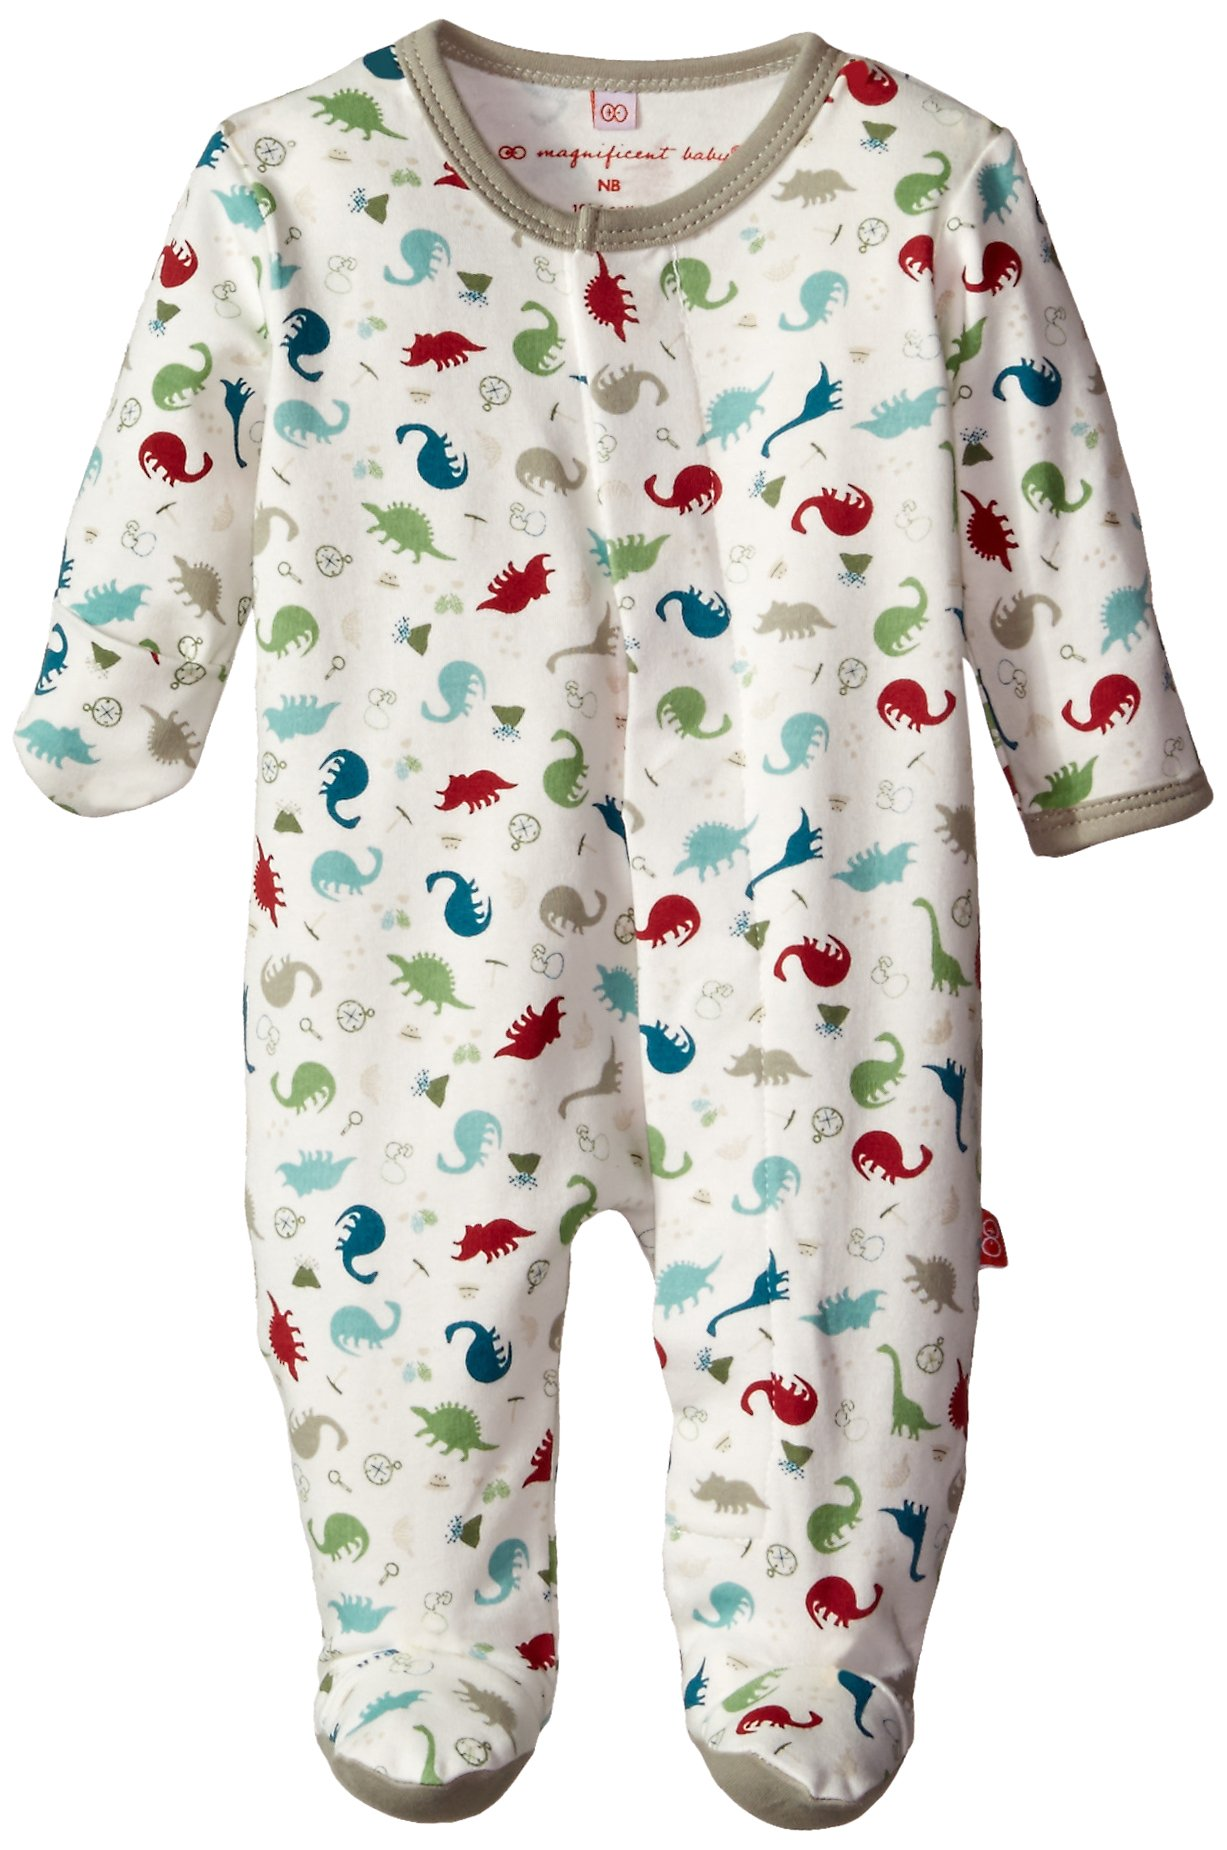 Magnificent Baby Baby Boys' Footie, Dino